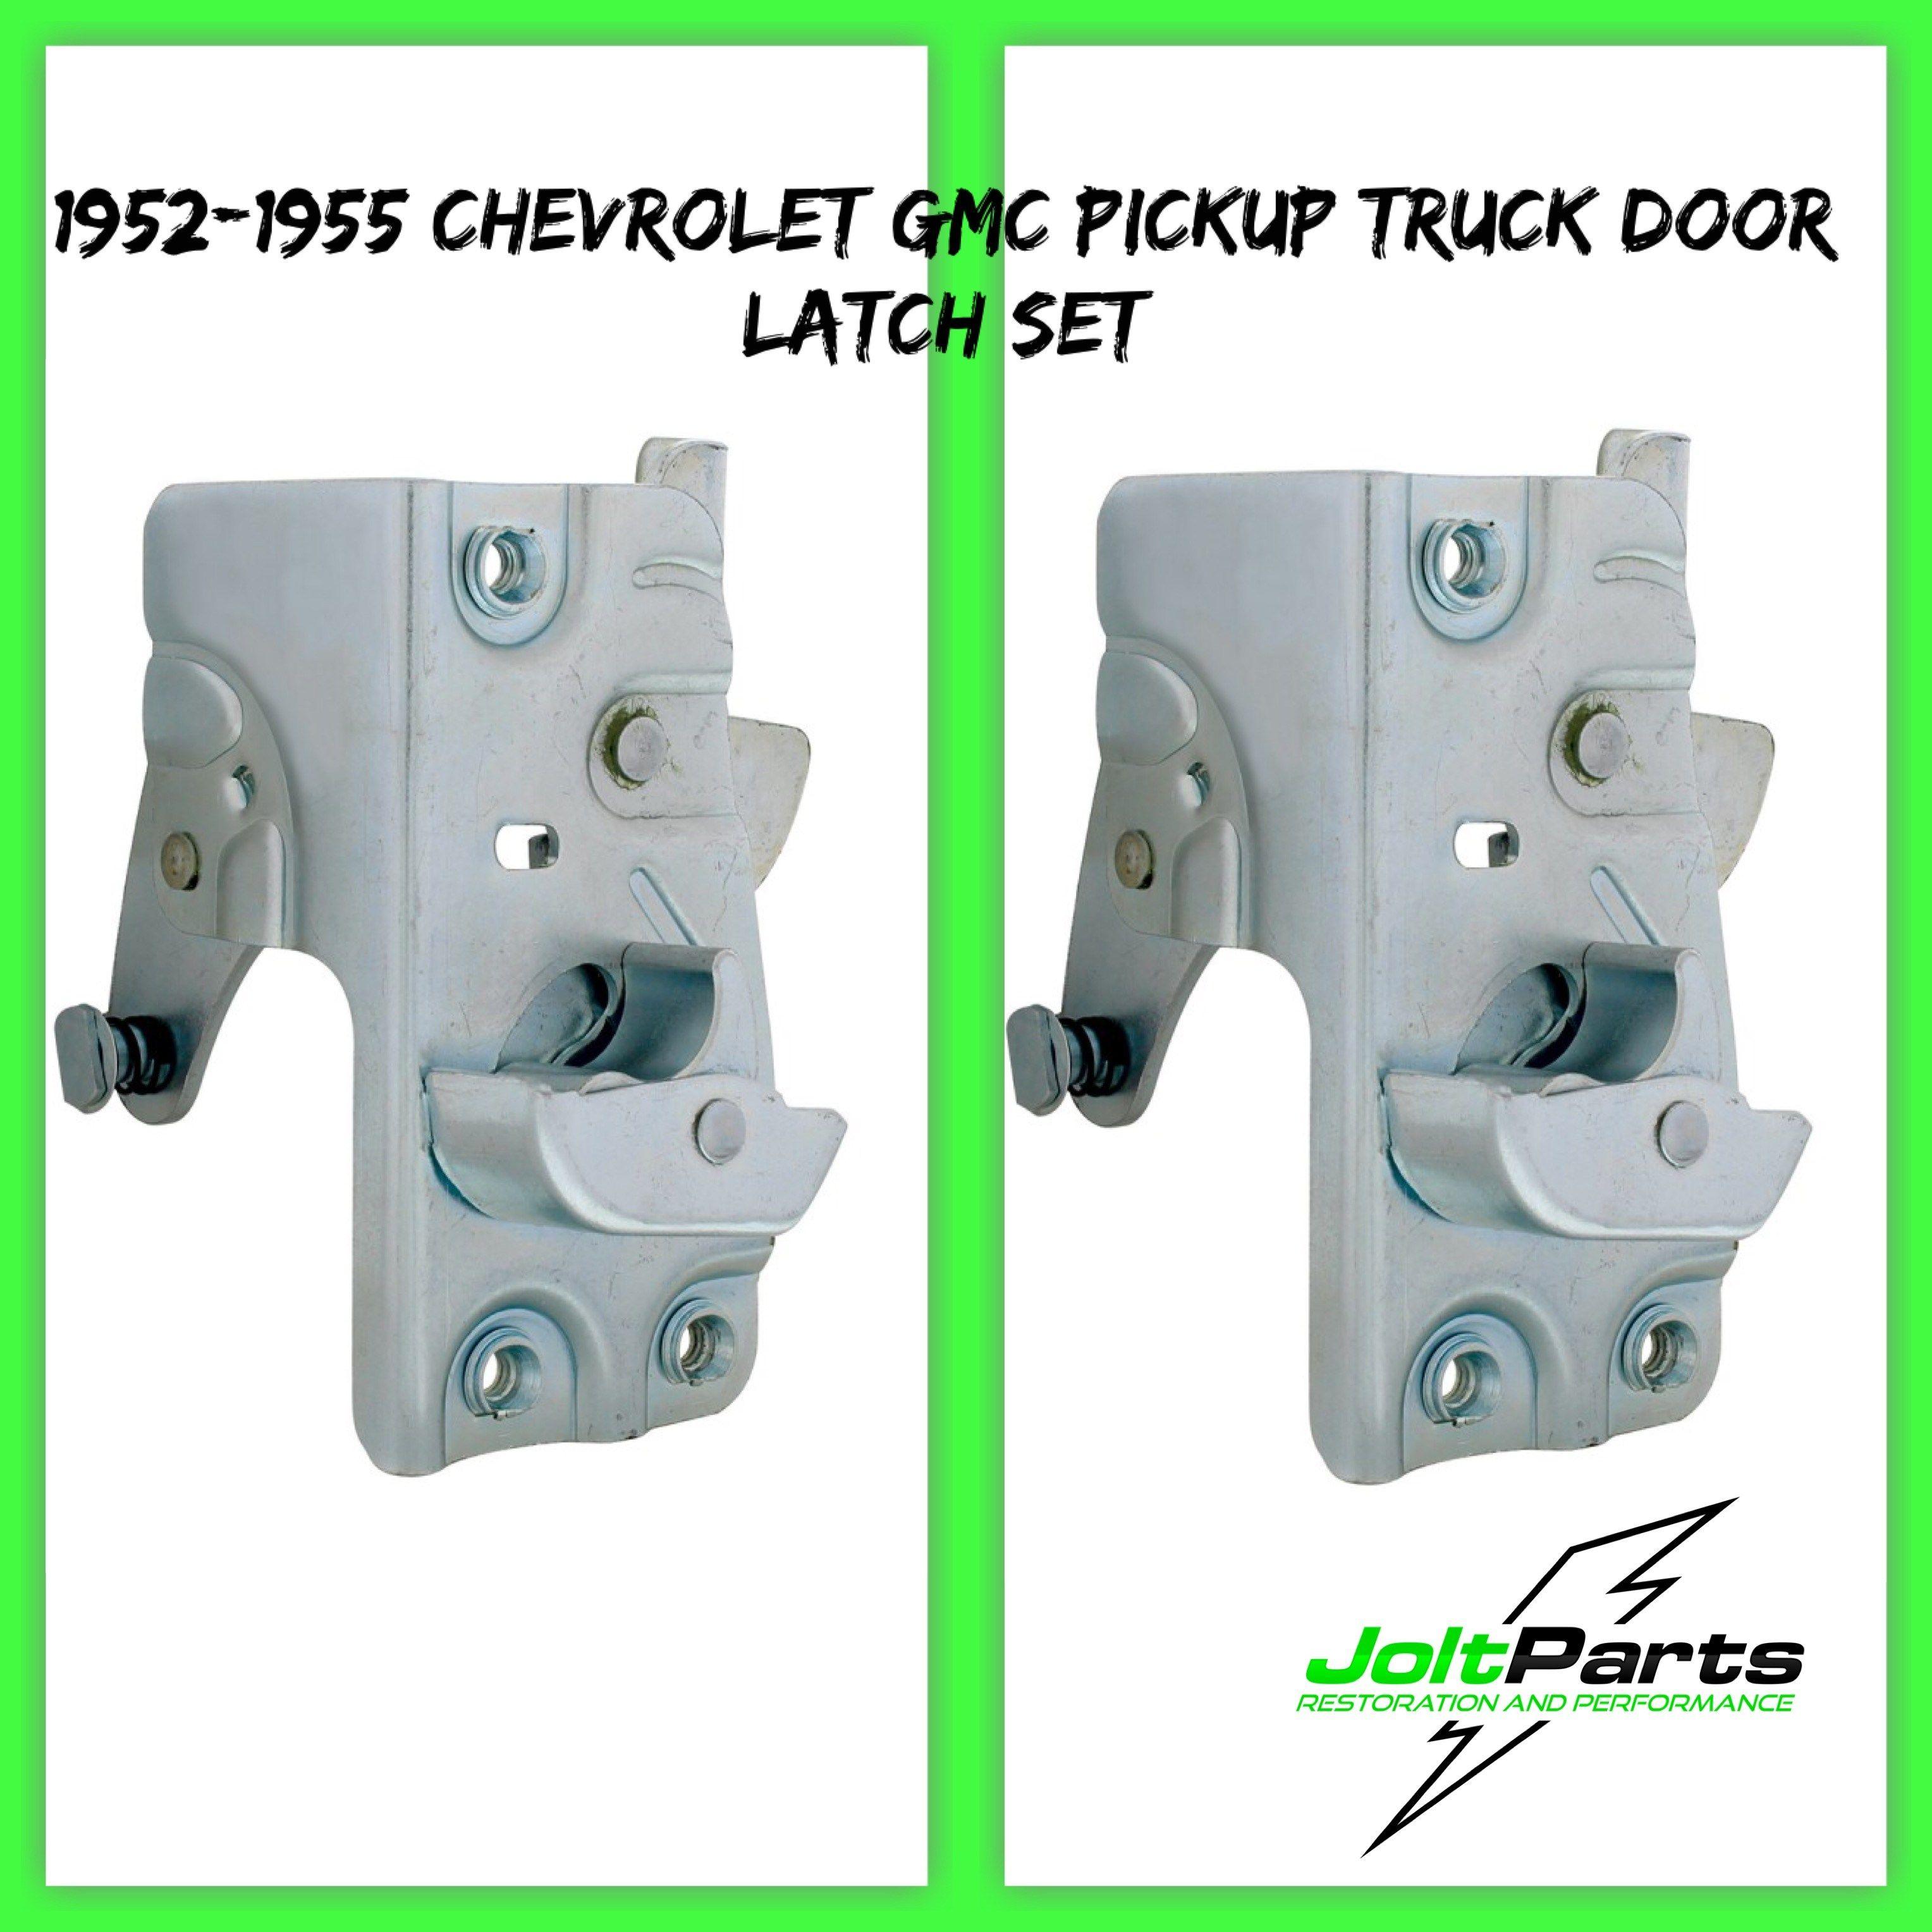 United Pacific 110188 89 1952 1955 Chevy Gmc Pickup Truck Hand